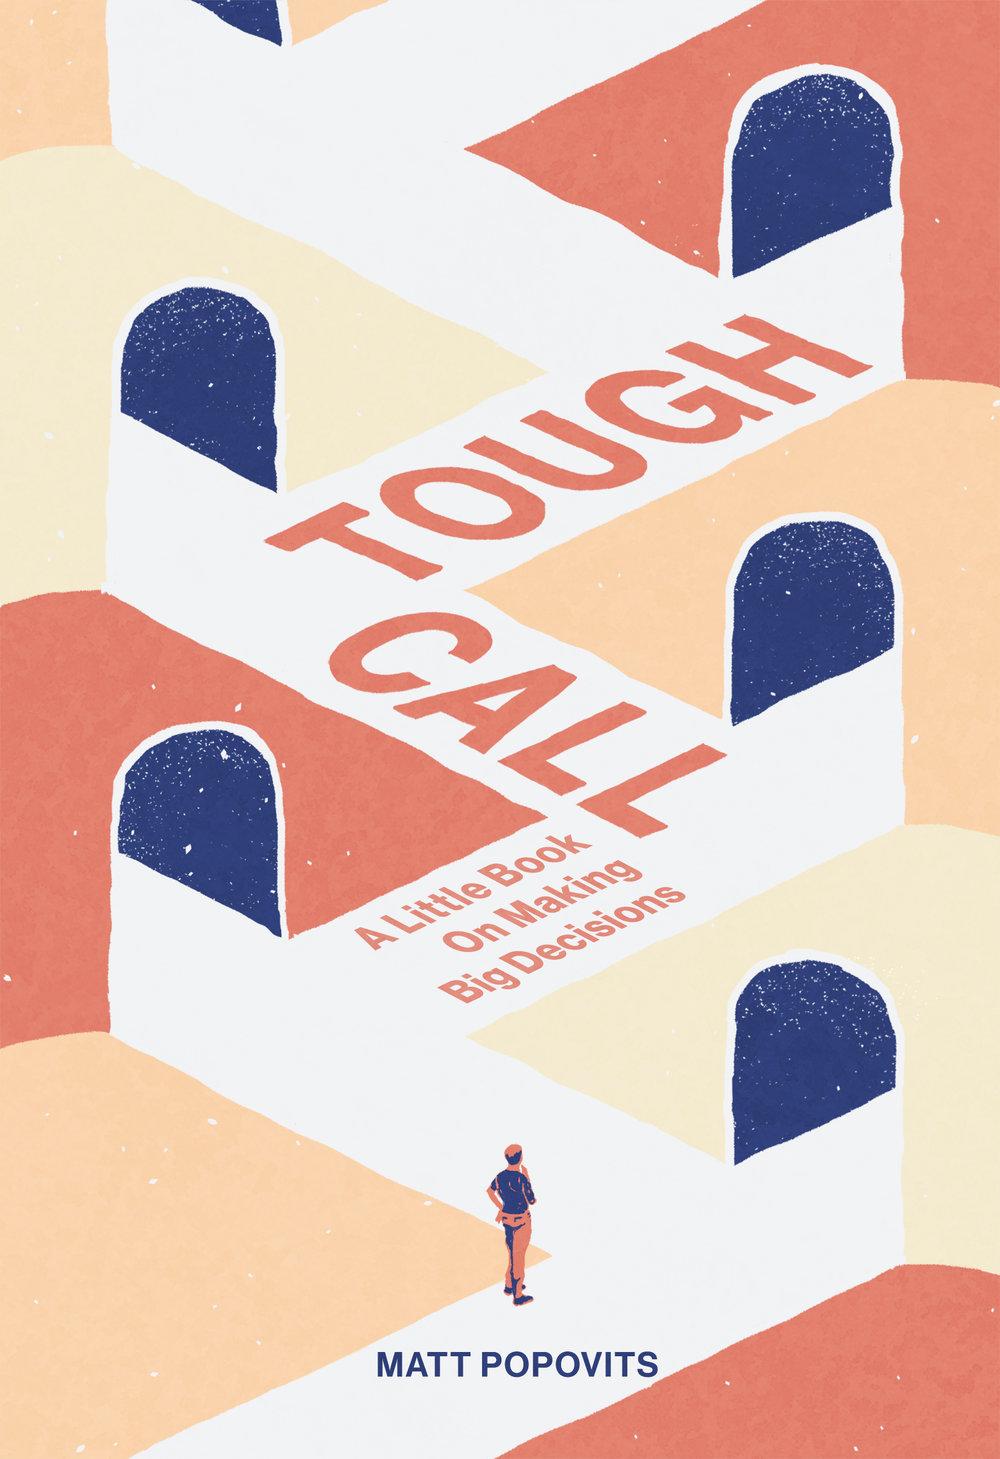 Tough Call - Also available at Amazon.com